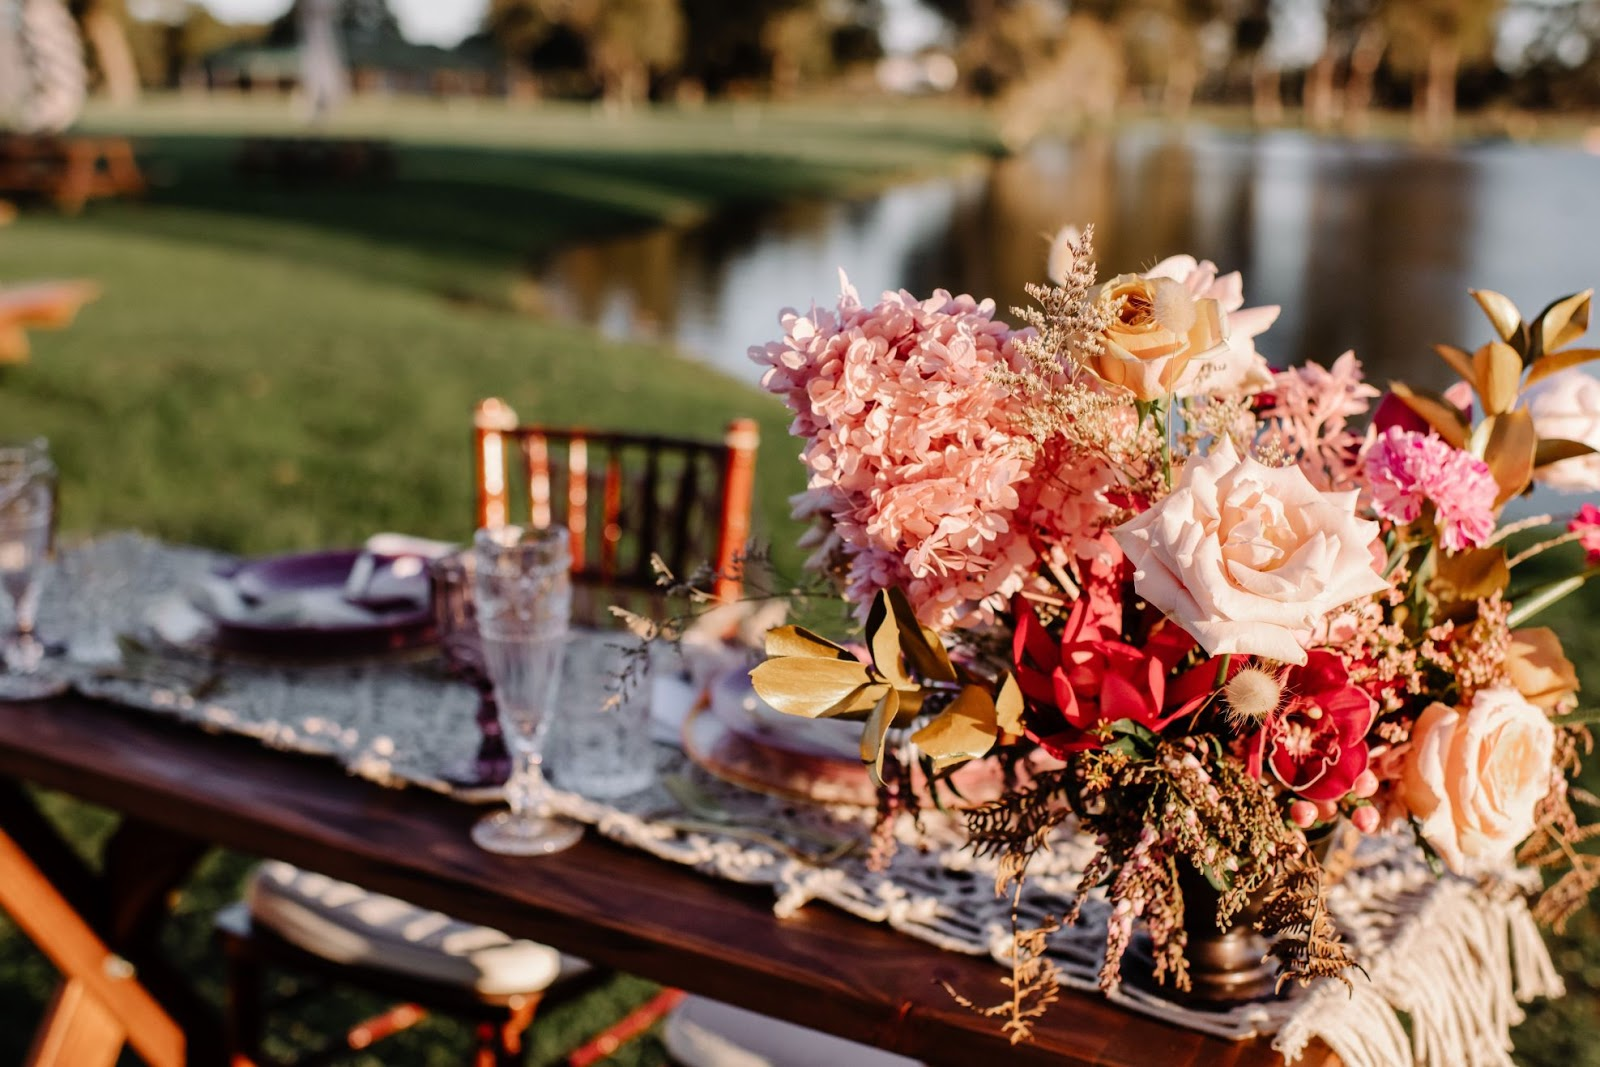 sandie bertrand photography perth weddings bridal gowns floral designer venue styling